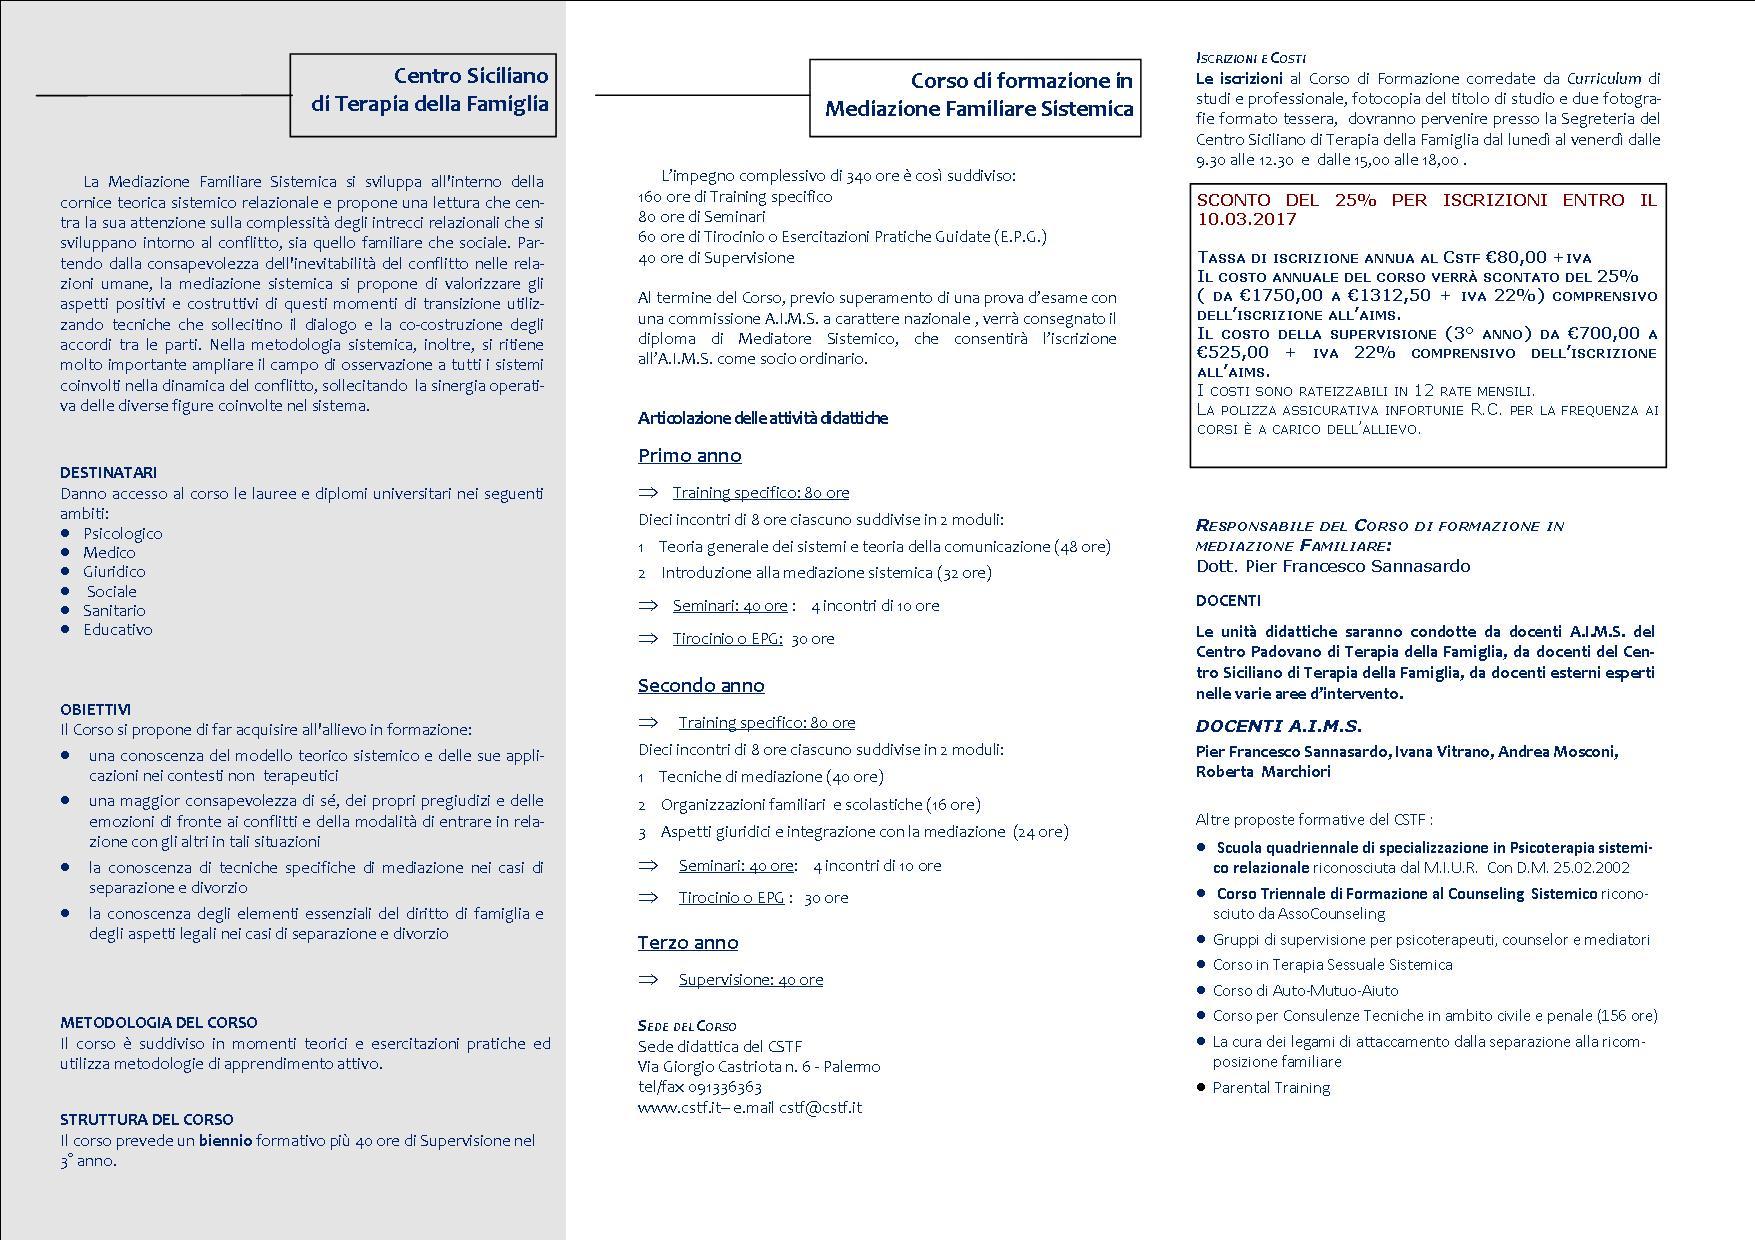 Brochure mediazione 2017 dentro